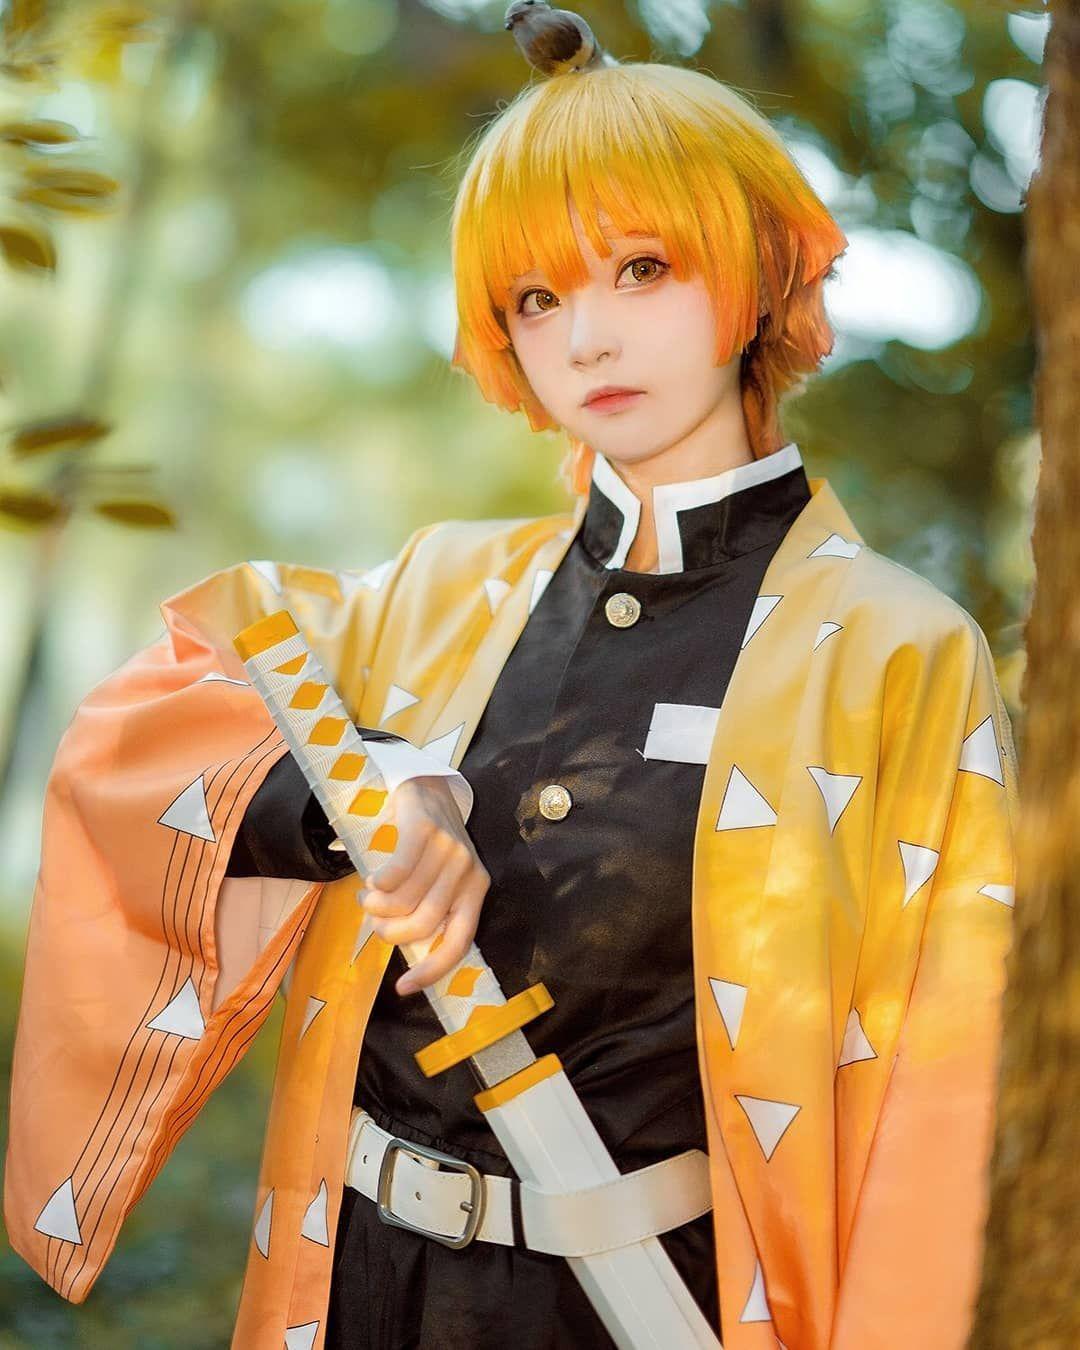 Cosplay Art Credits Xiaorouseeu Fsℓℓsw Ys Anime 0n Anime Animefan Animejapan Cosplay Anime Anime Cosplay Costumes Manga Cosplay